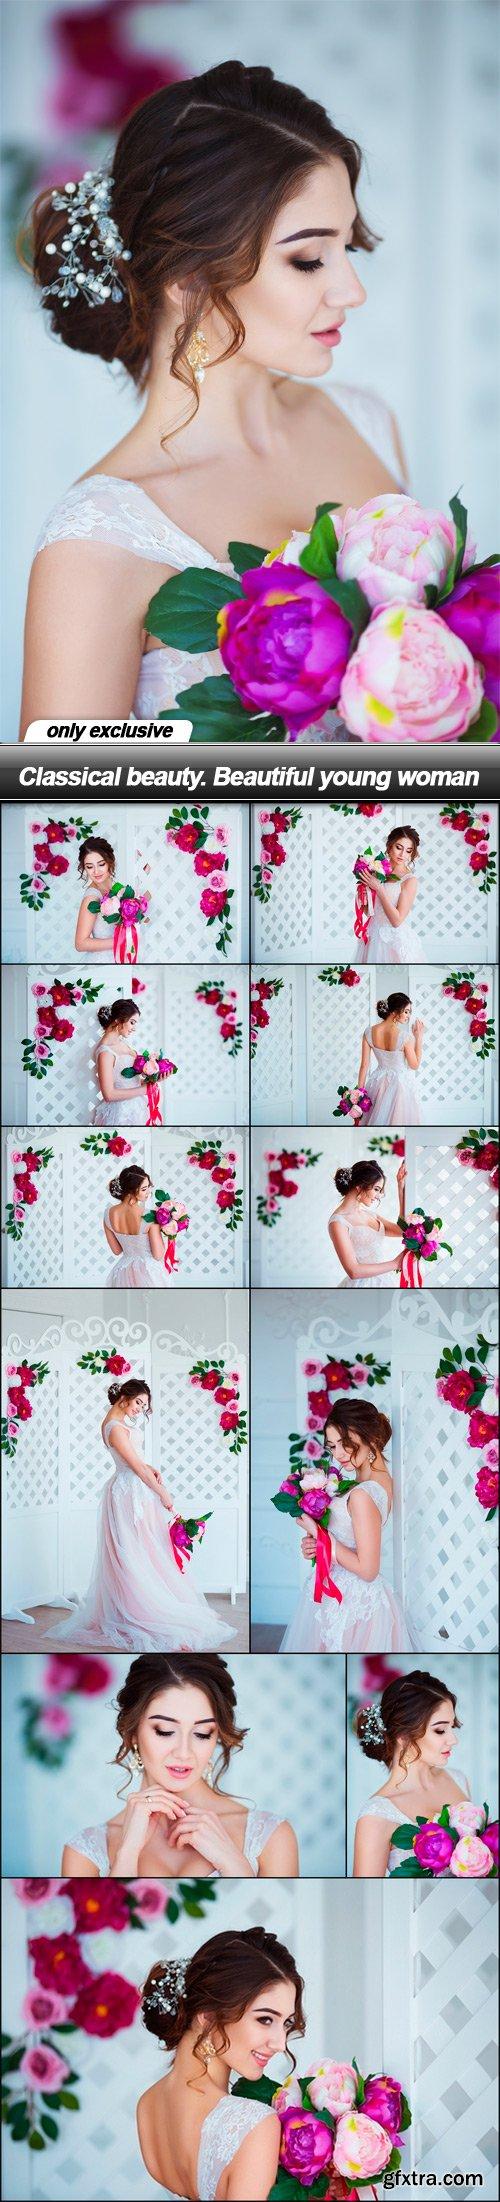 Classical beauty. Beautiful young woman - 11 UHQ JPEG